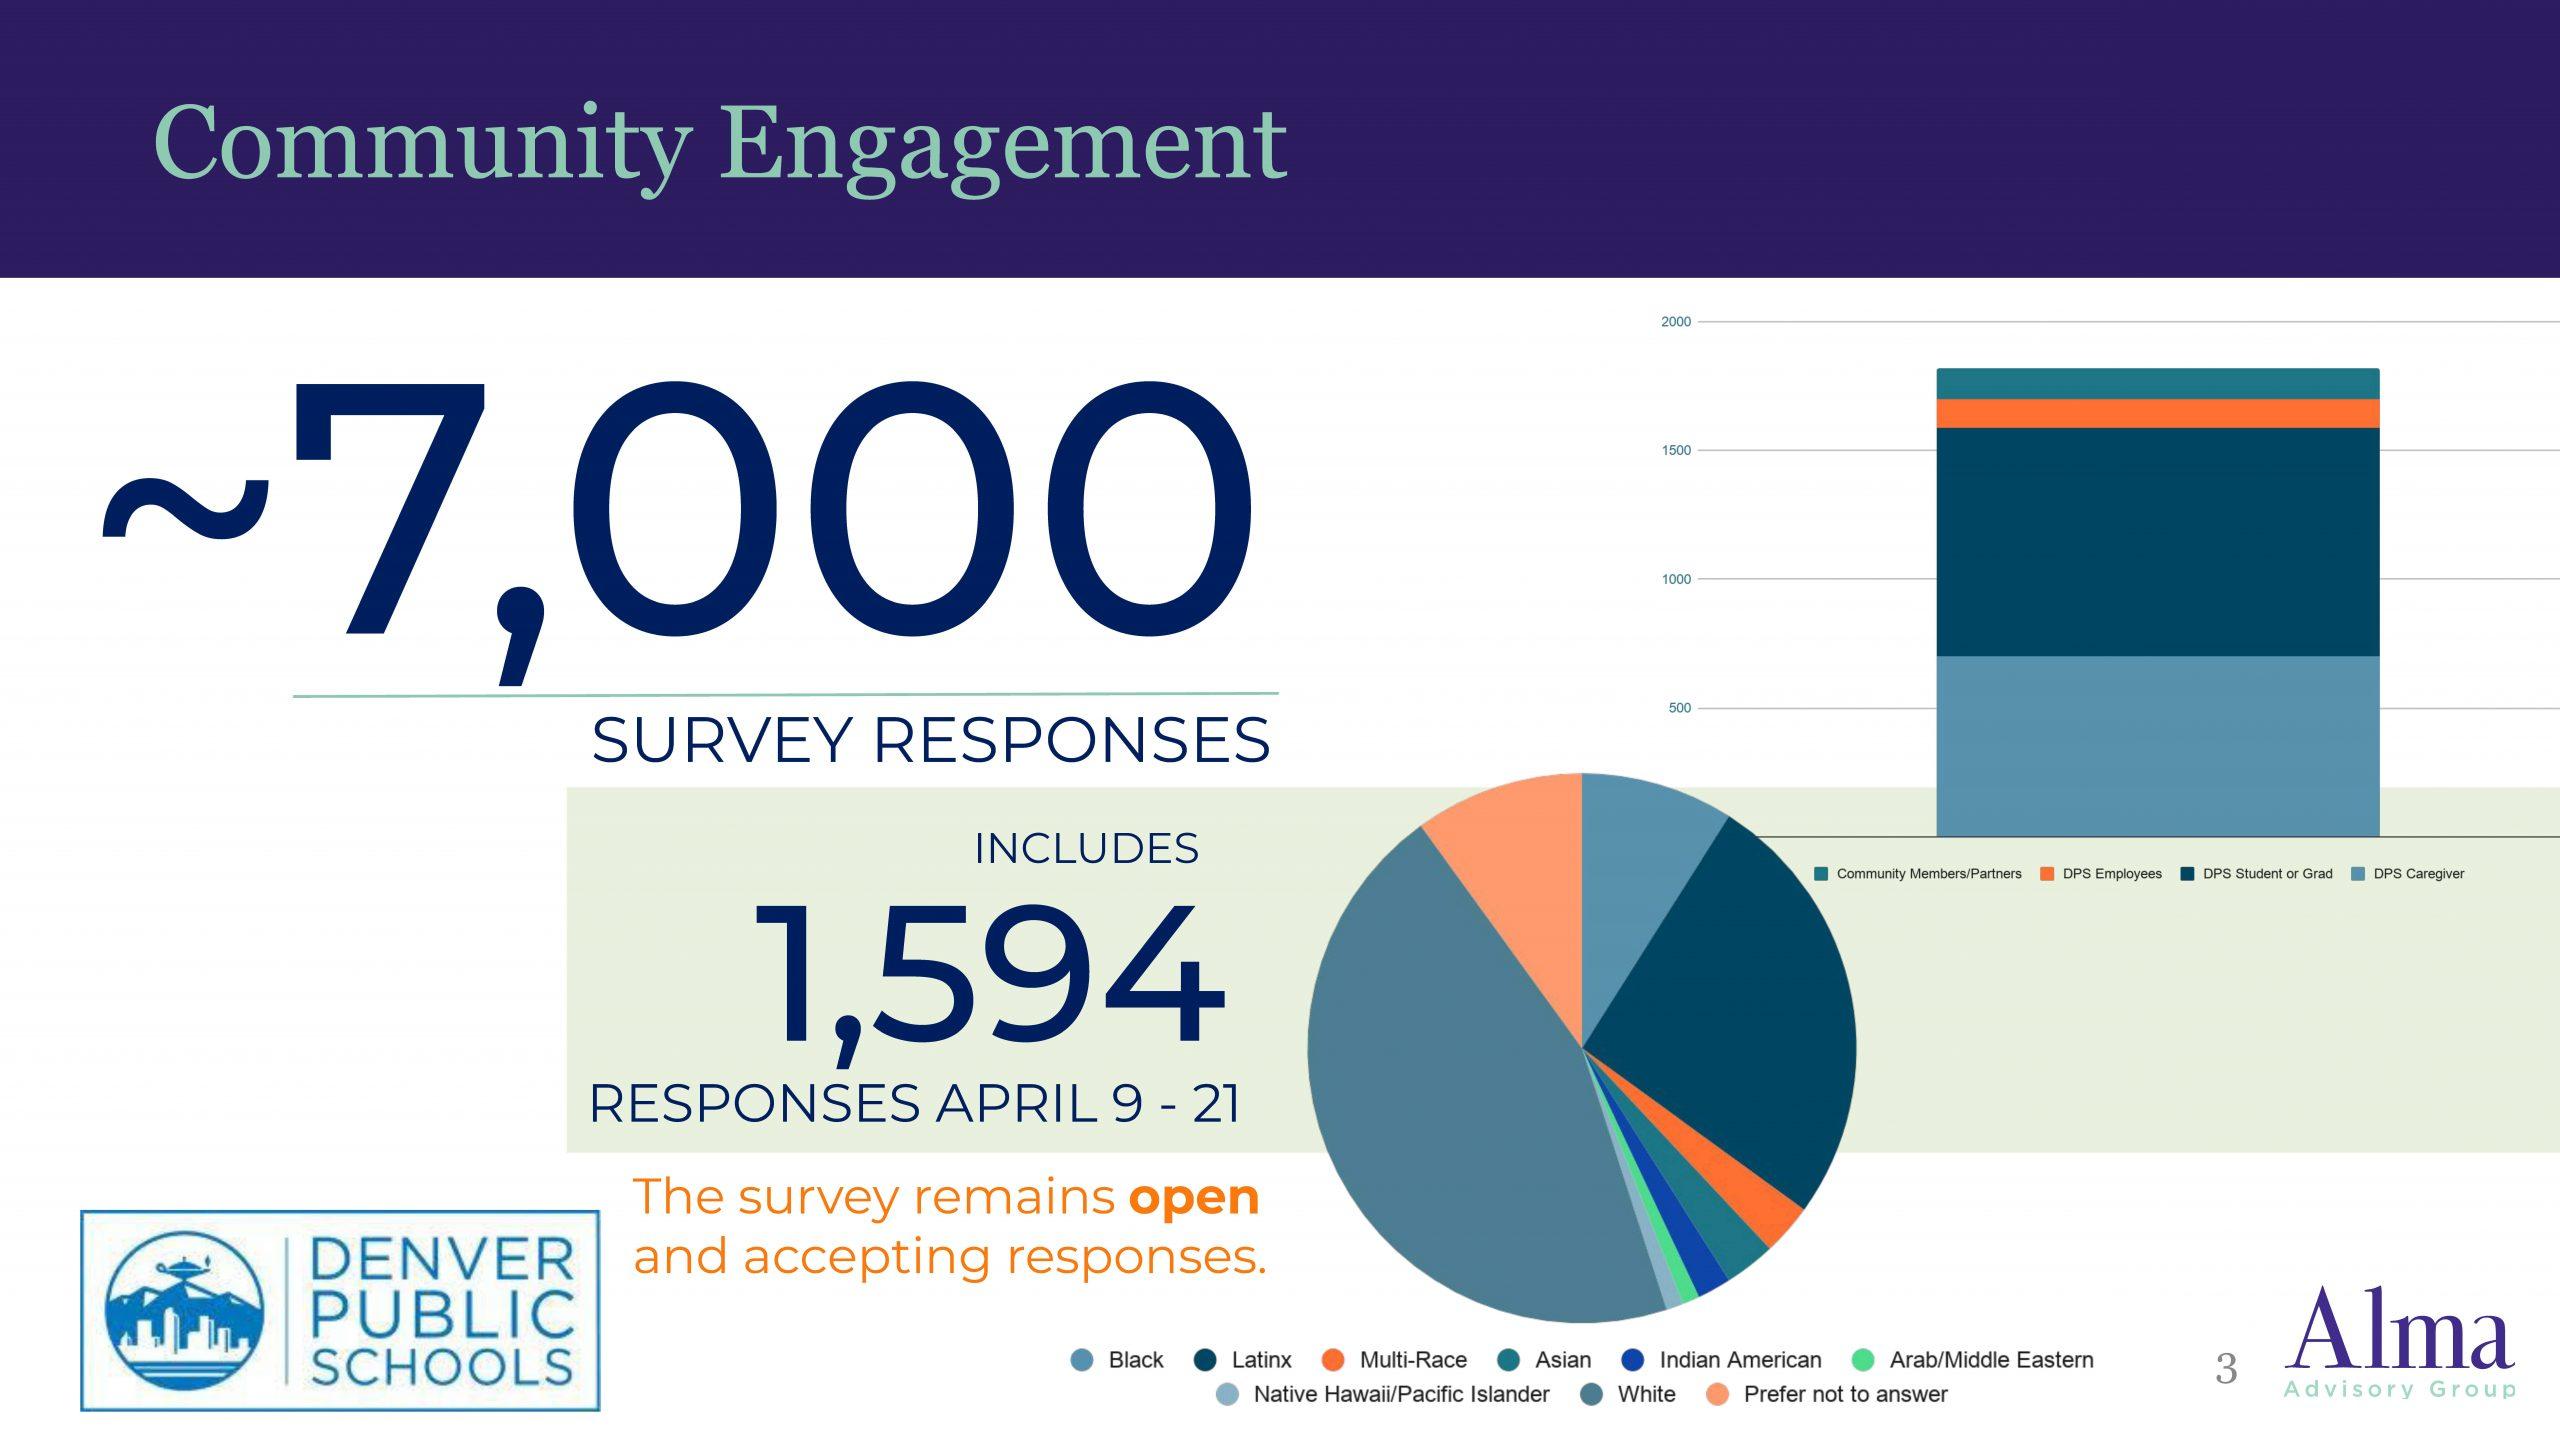 Approximately 7,000 survey responses